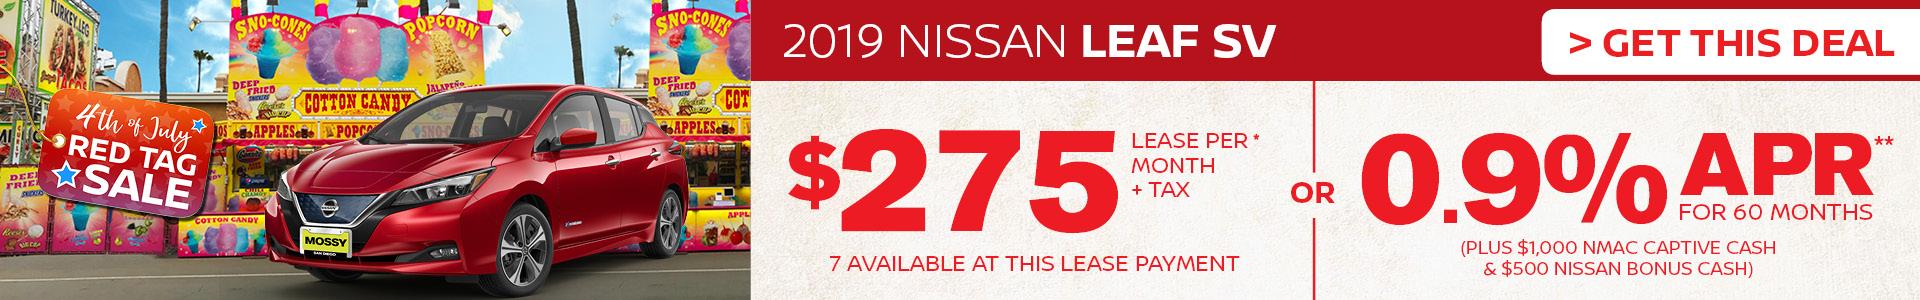 Mossy Nissan - Nissan LEAF $275 Lease